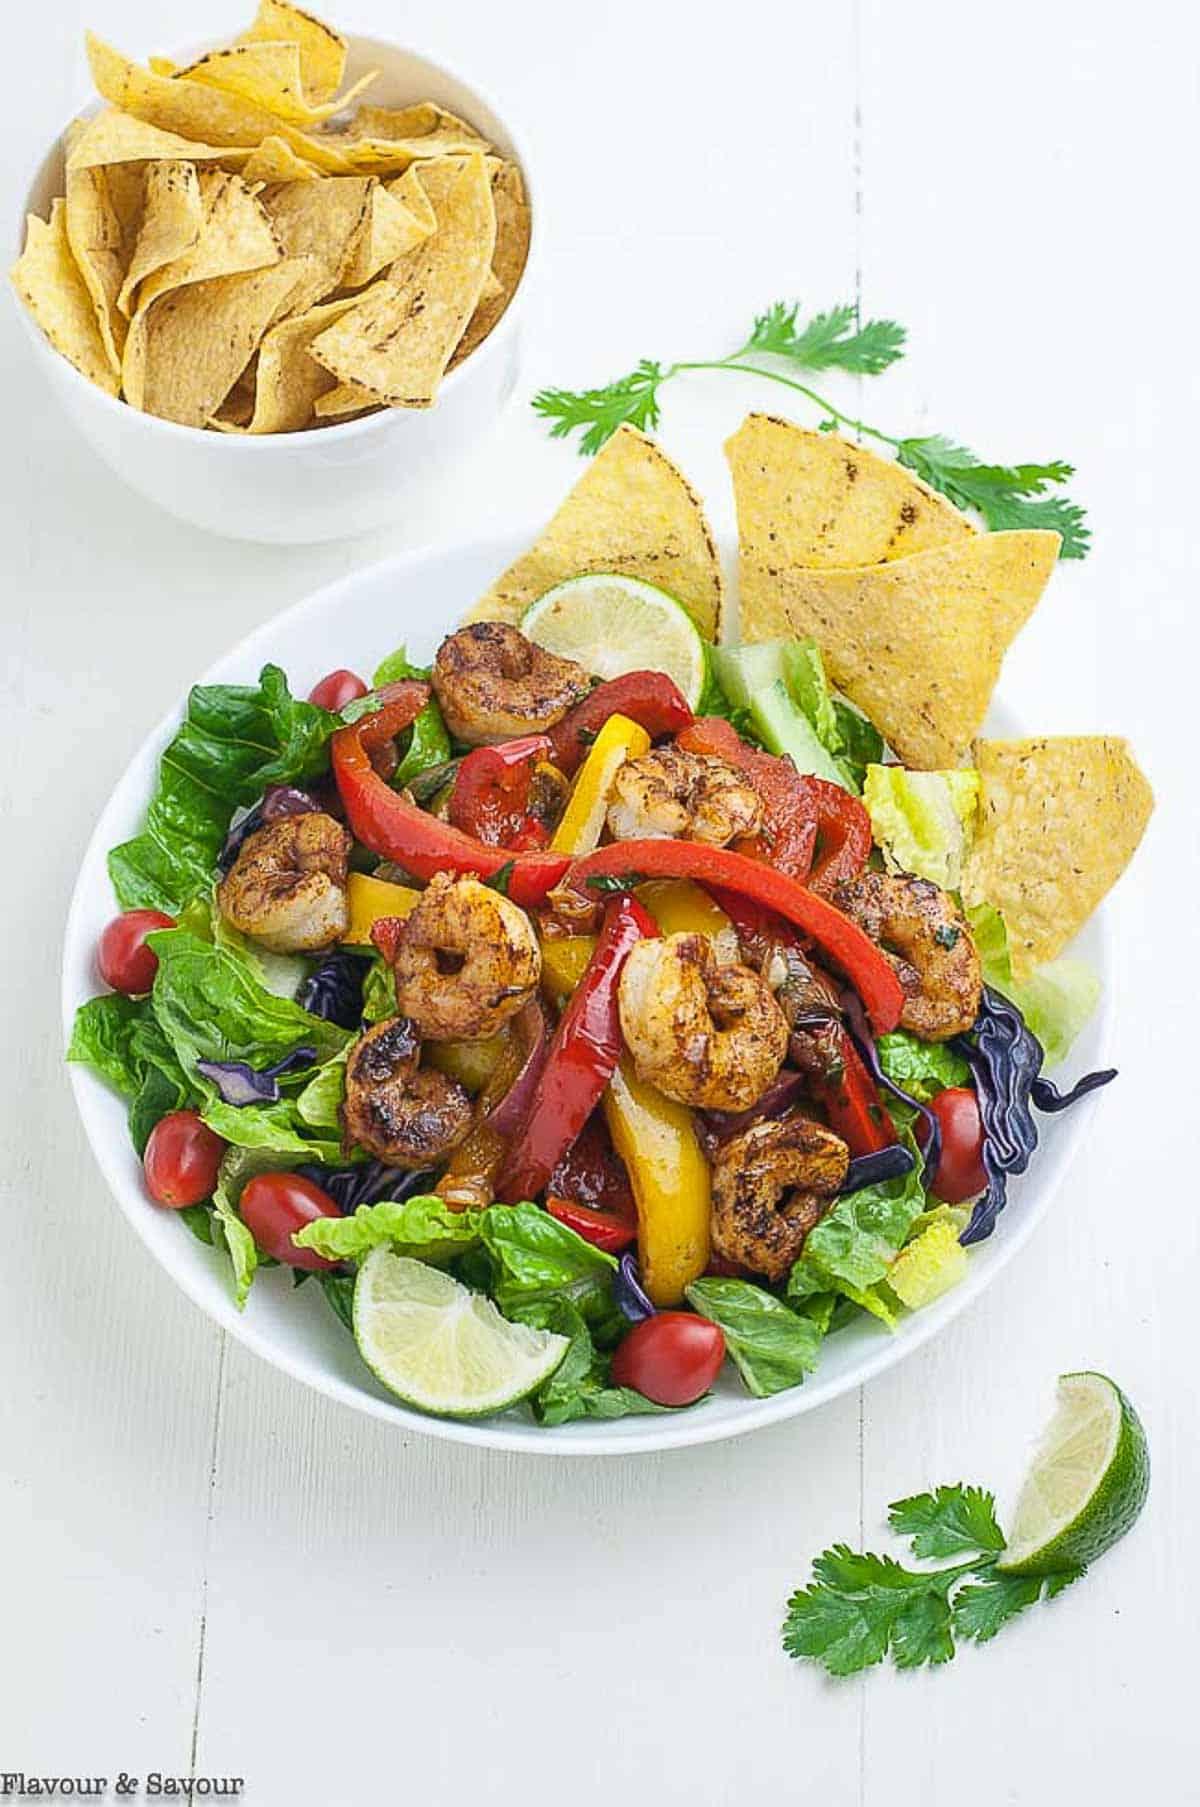 Shrimp Fajita Salad with tortilla chips overhead view